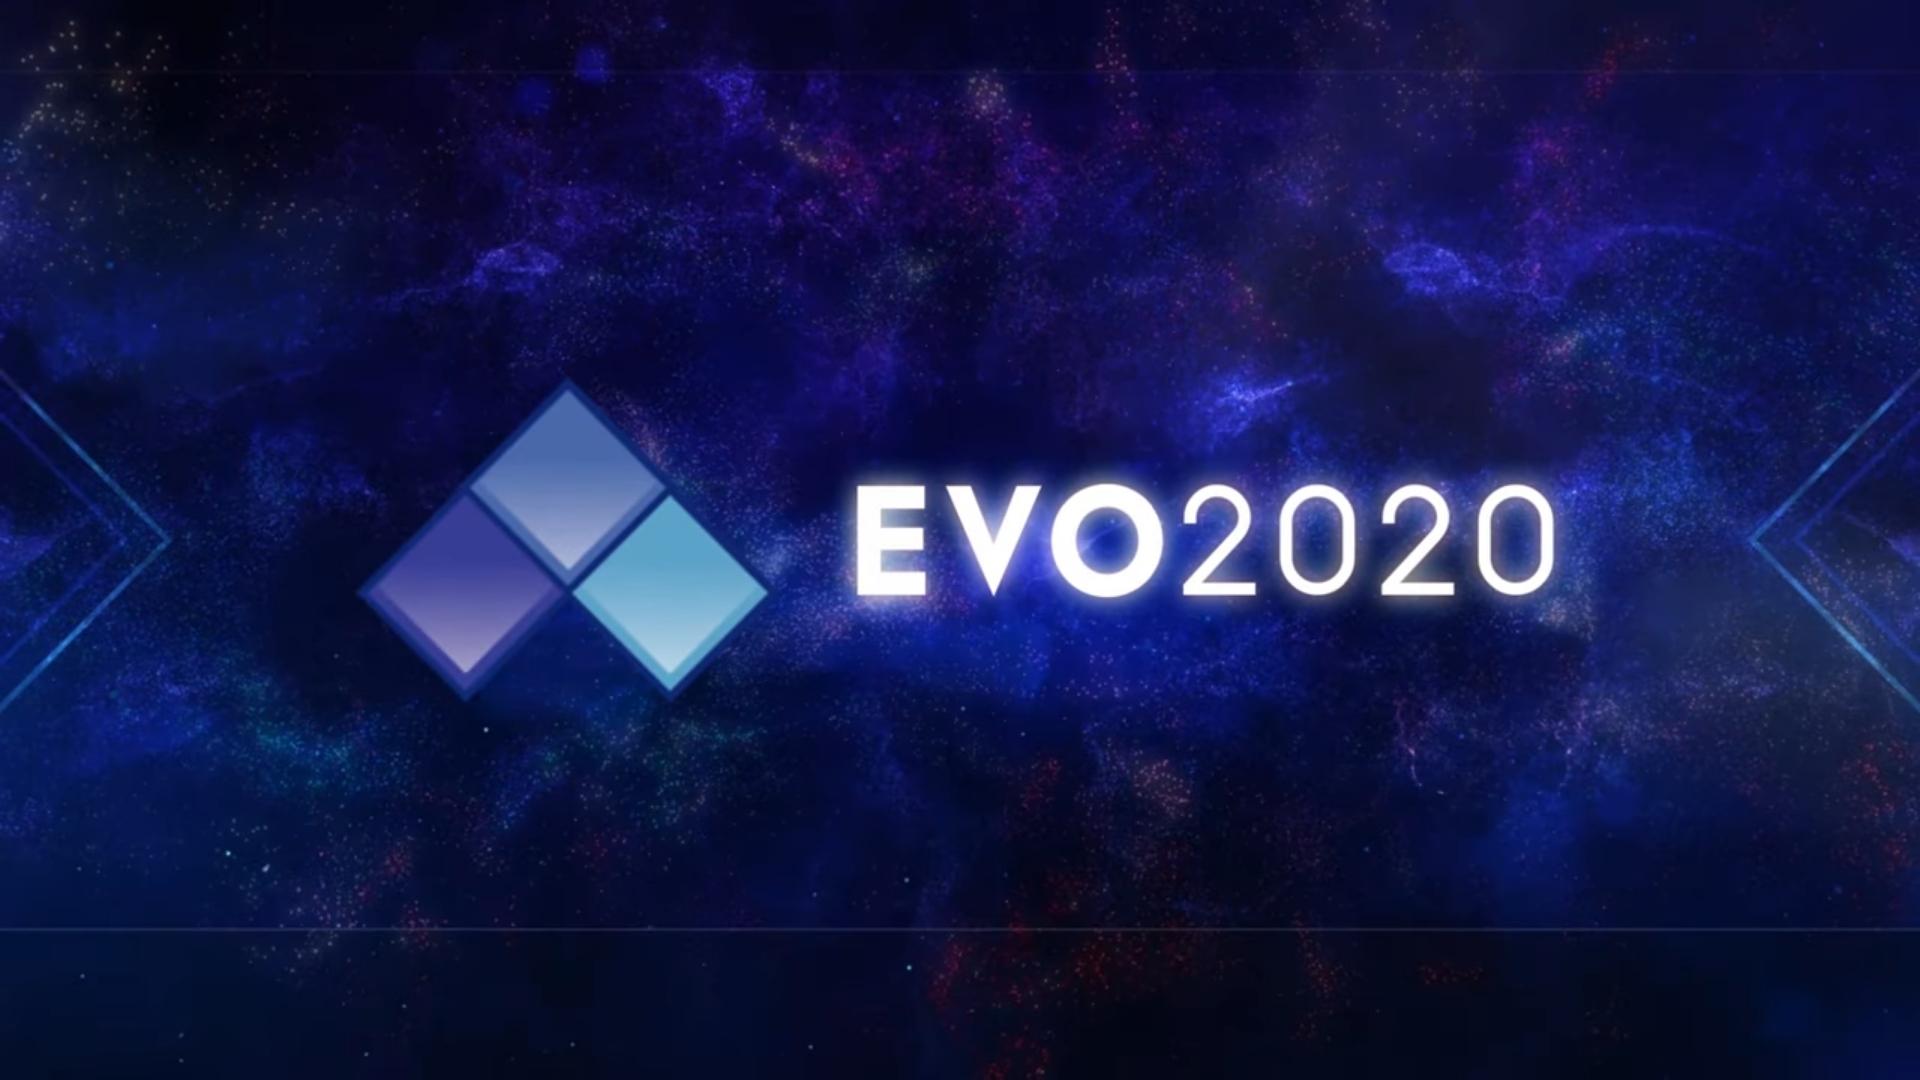 Evo 2020 Games.Evo 2020 Will Be In Las Vegas Dot Esports